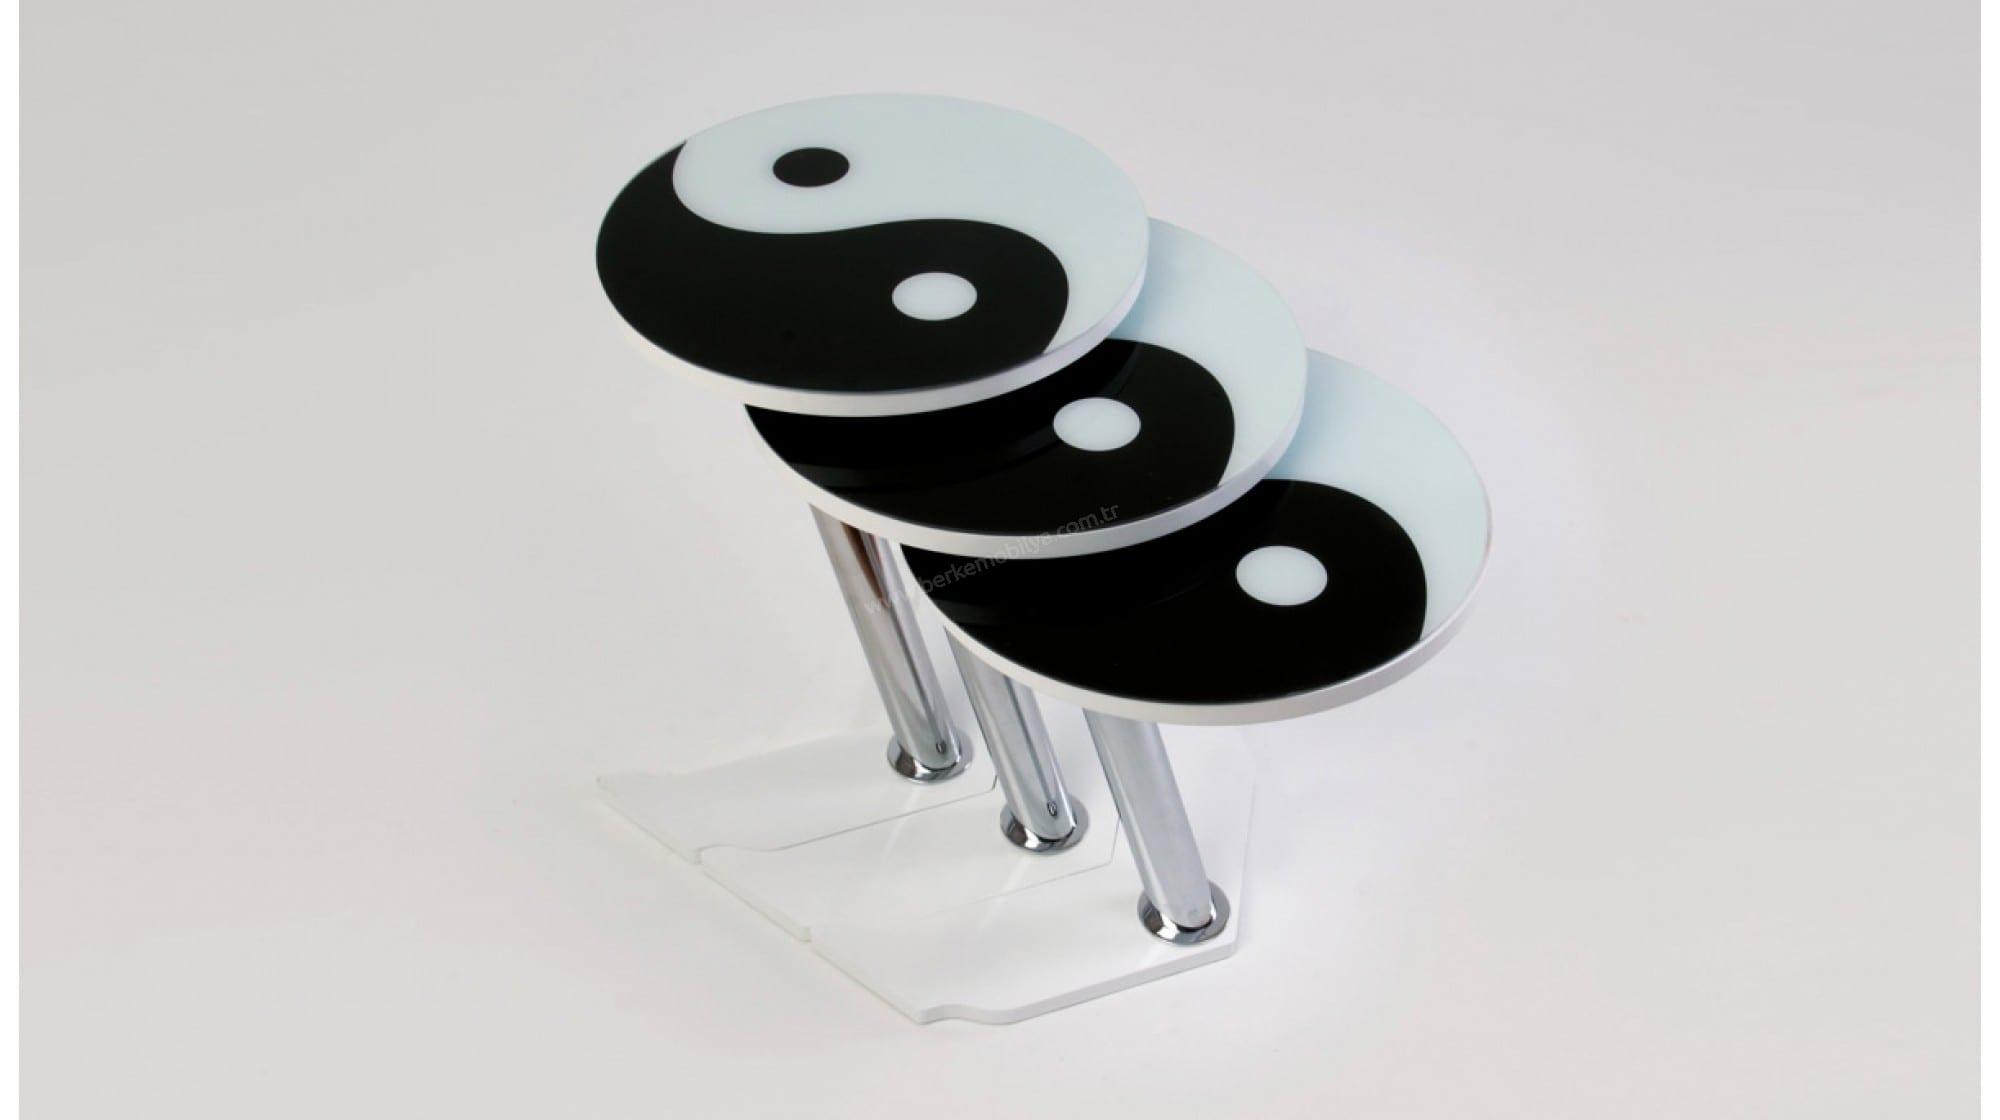 siyah beyaz Zigon Sehpa Modelleri